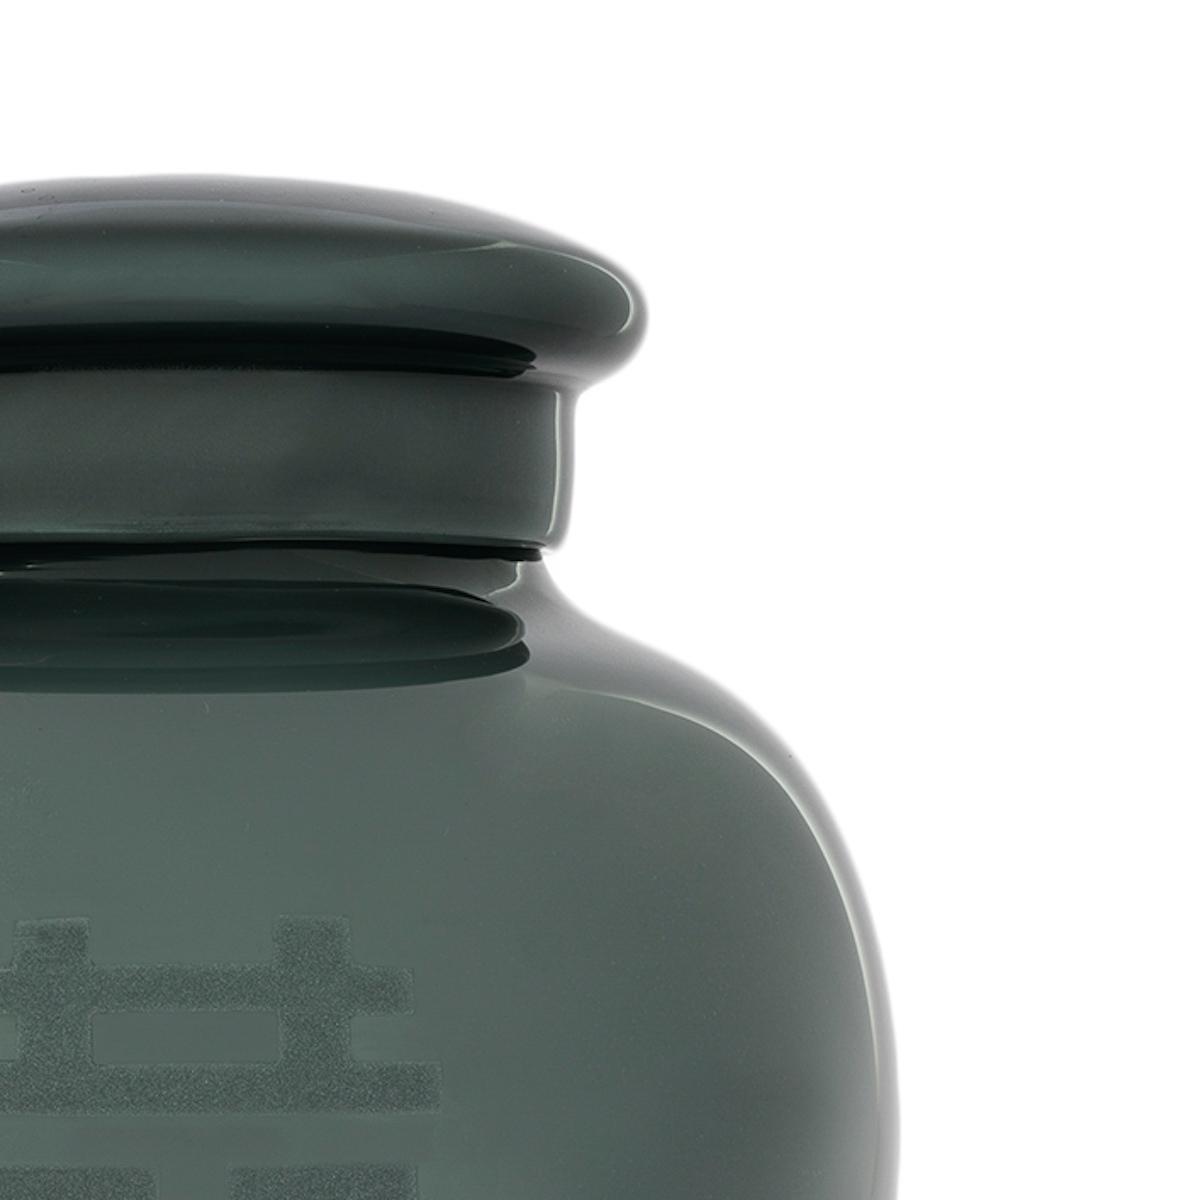 vaso-cinese-chinese-vase-grey-venice-handmade